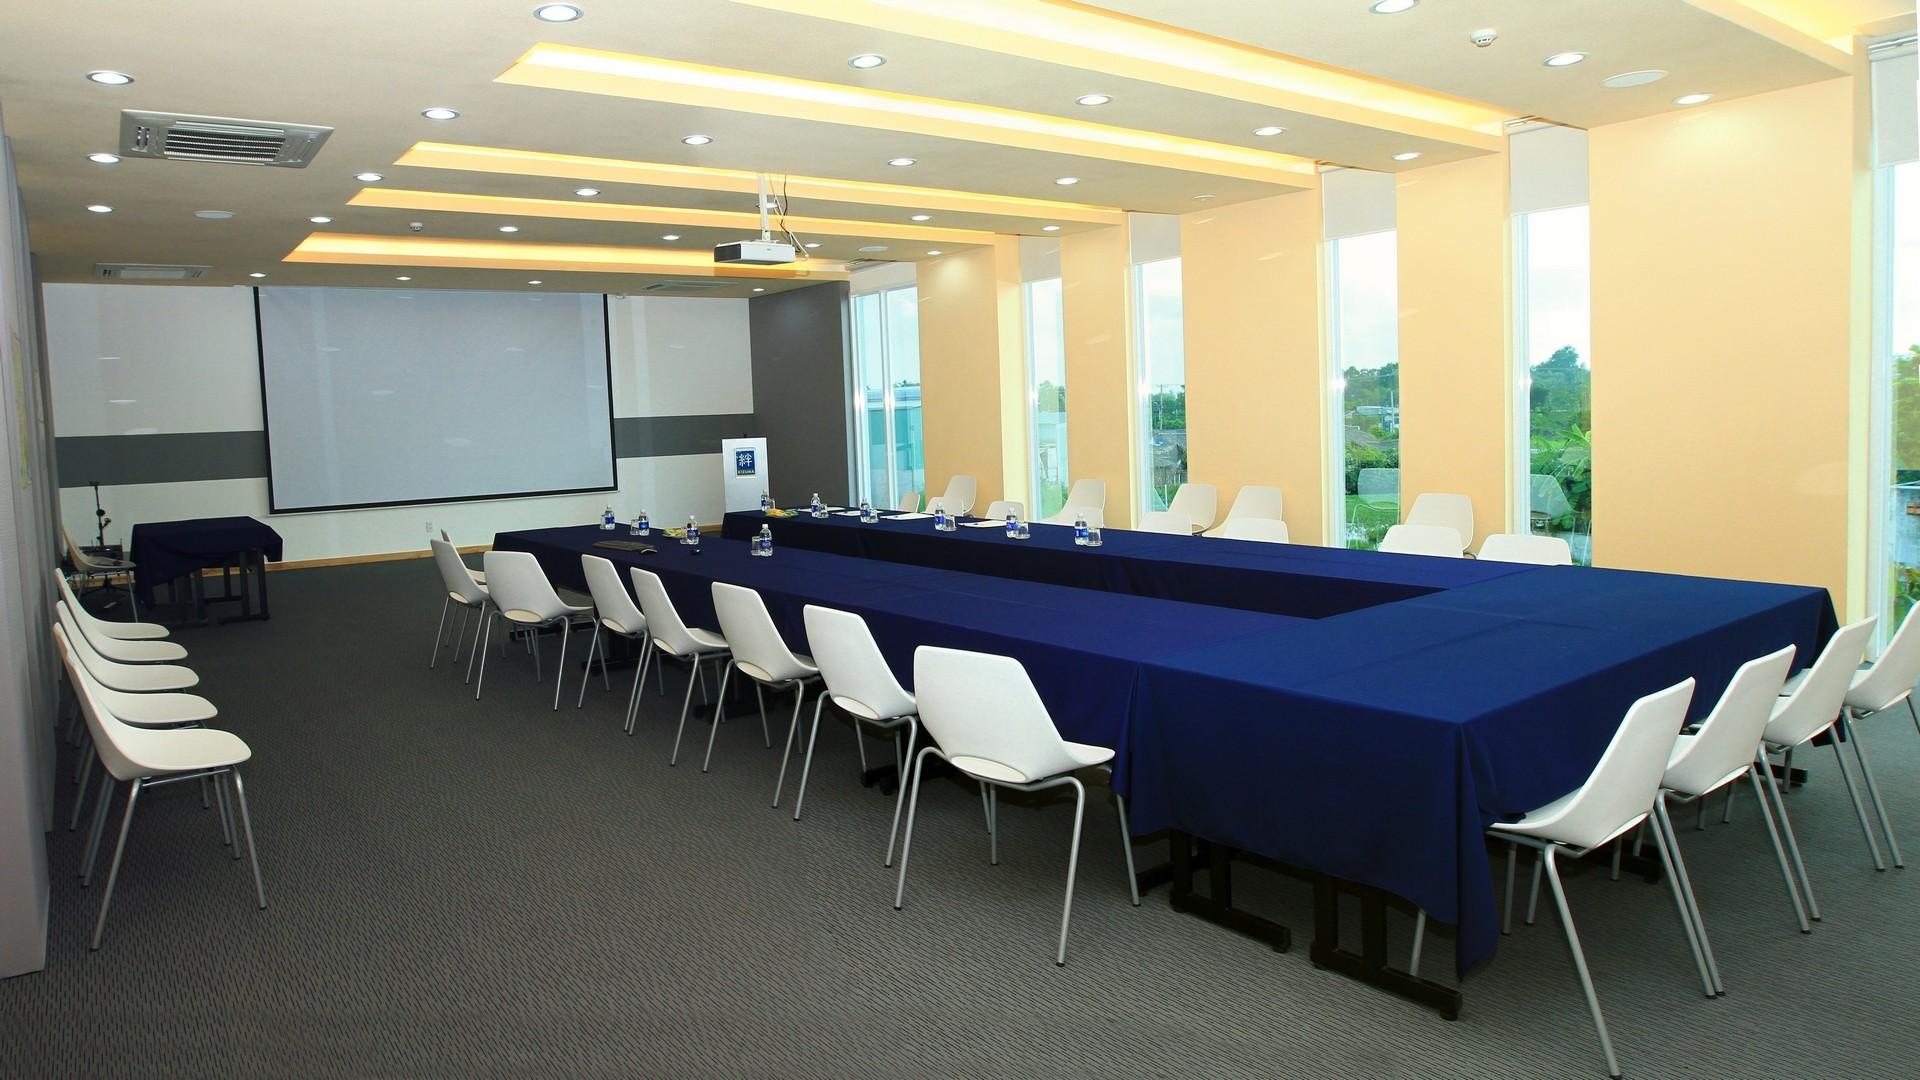 Phòng họp chia sẻ (tại Business Center của Kizuna)